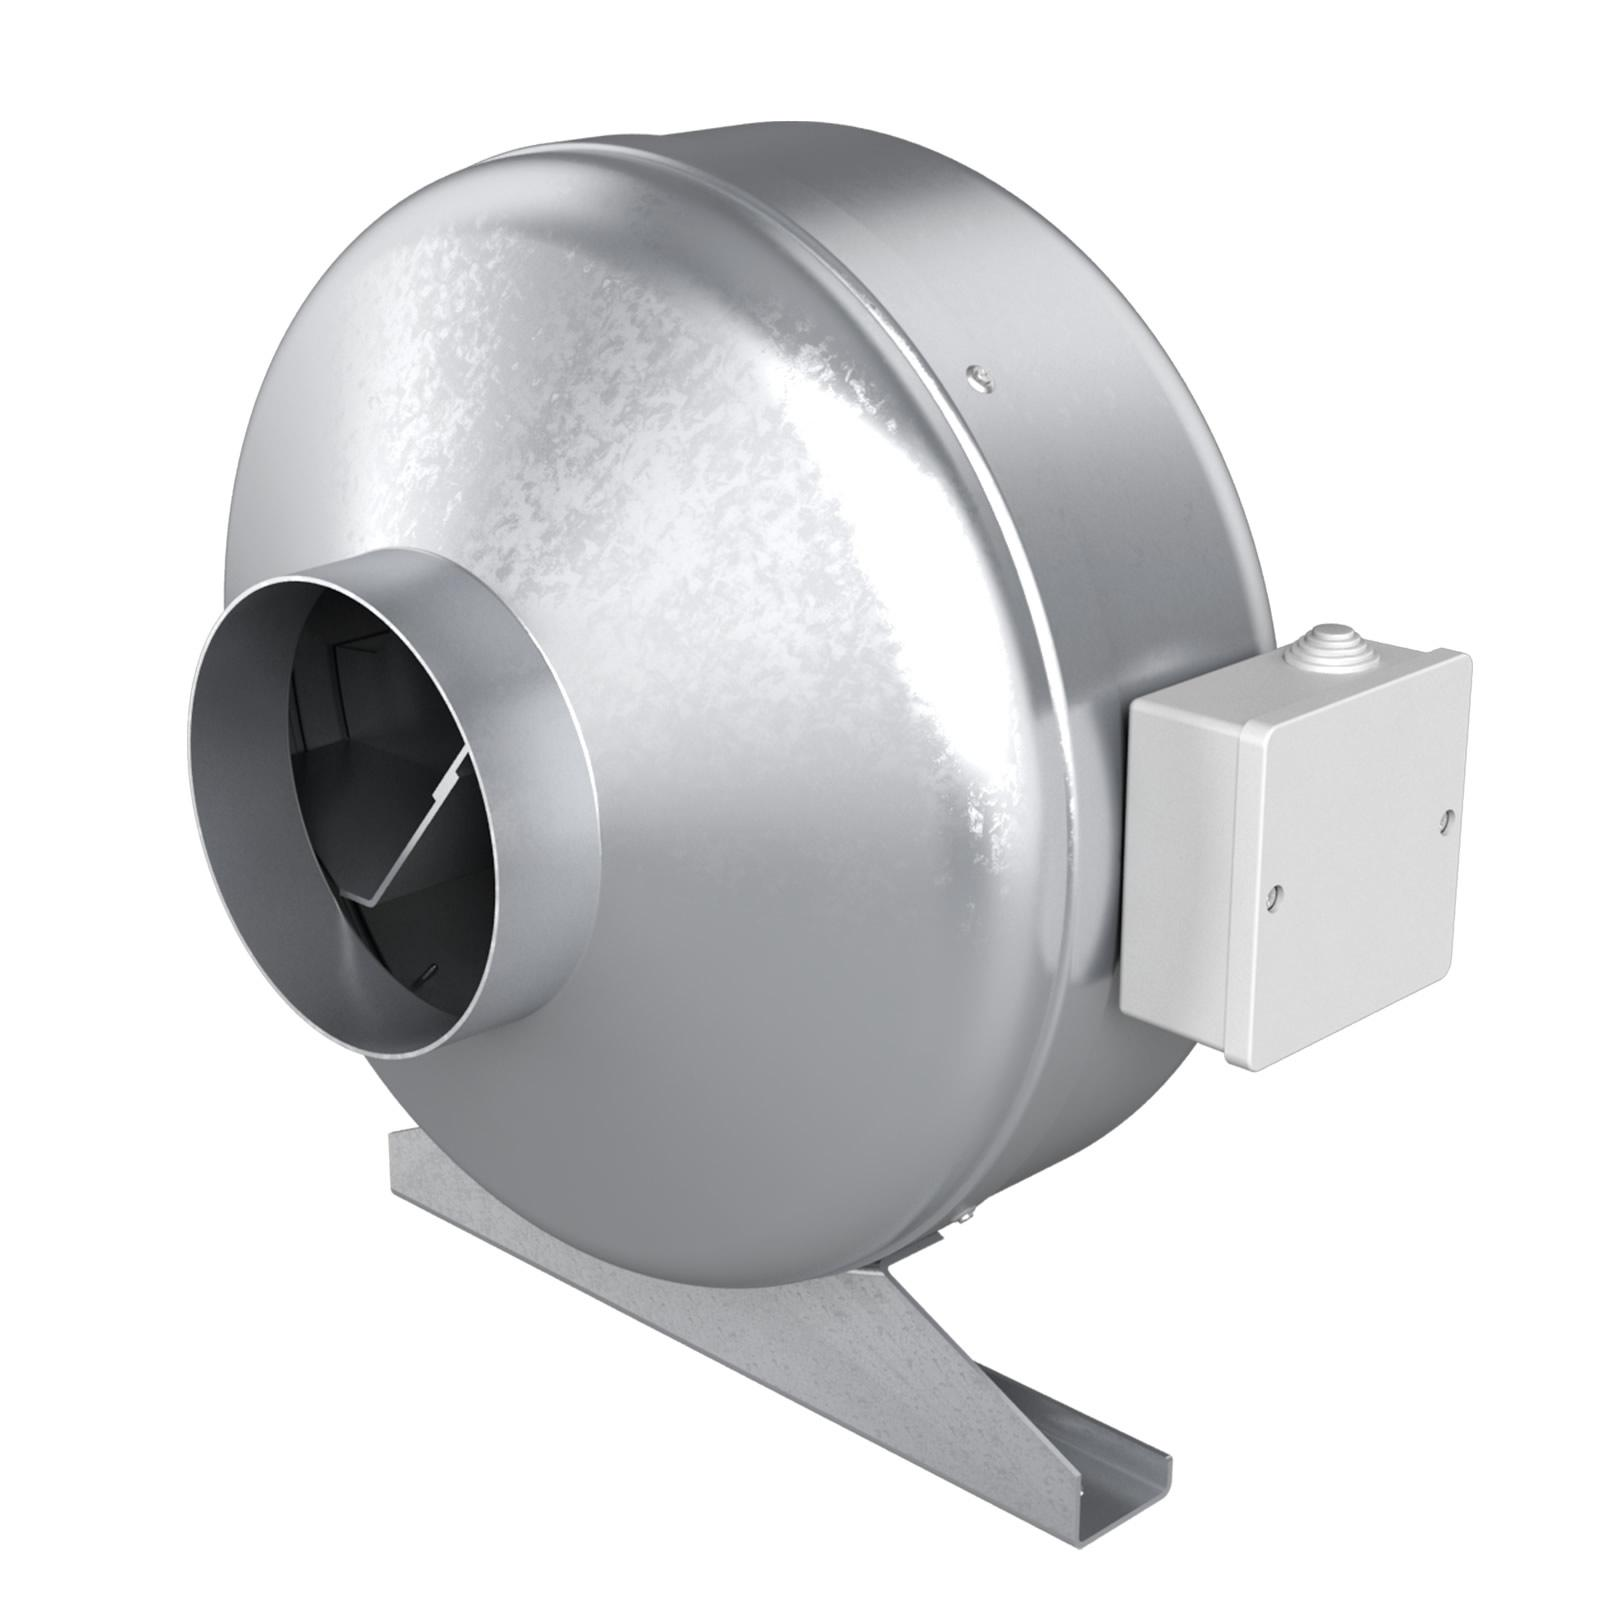 Вентилятор Era Mars gdf 250 era mars gdf 150 вентилятор центробежный канальный